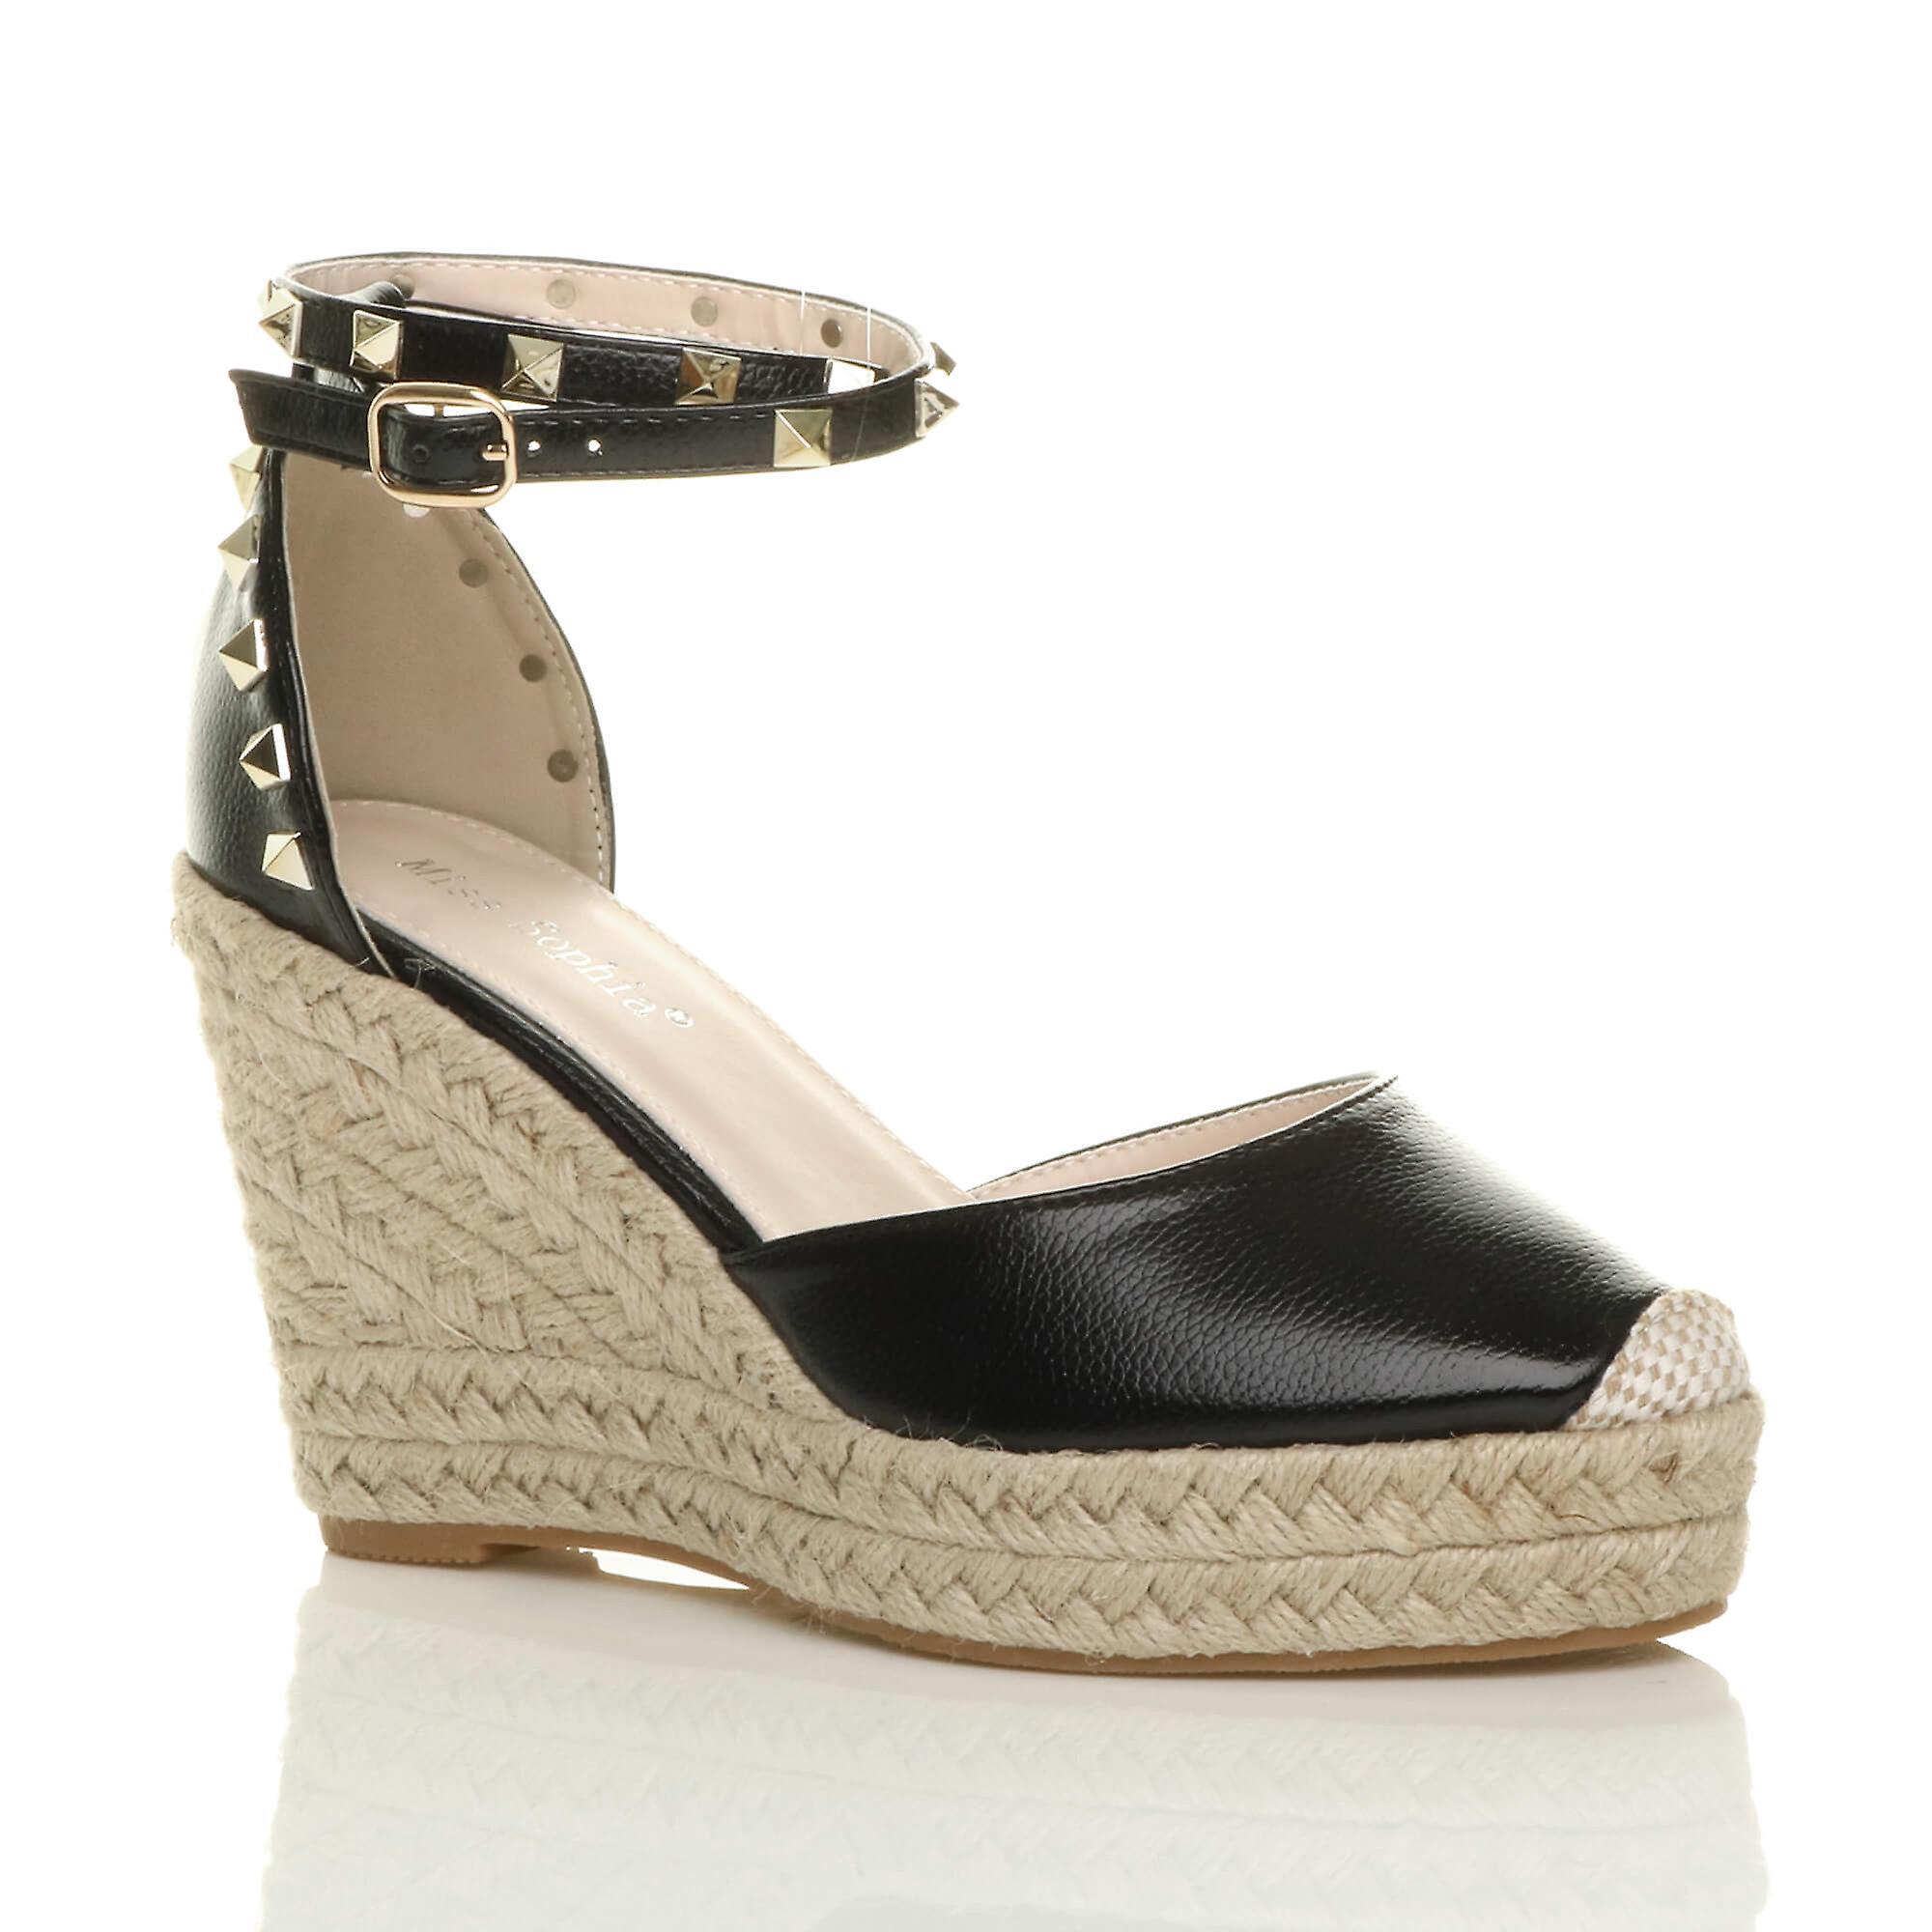 Ajvani donna high wedge heel studded ankle strap espadrilles scarpe sandals | Del Nuovo Di Stile  | Uomini/Donne Scarpa